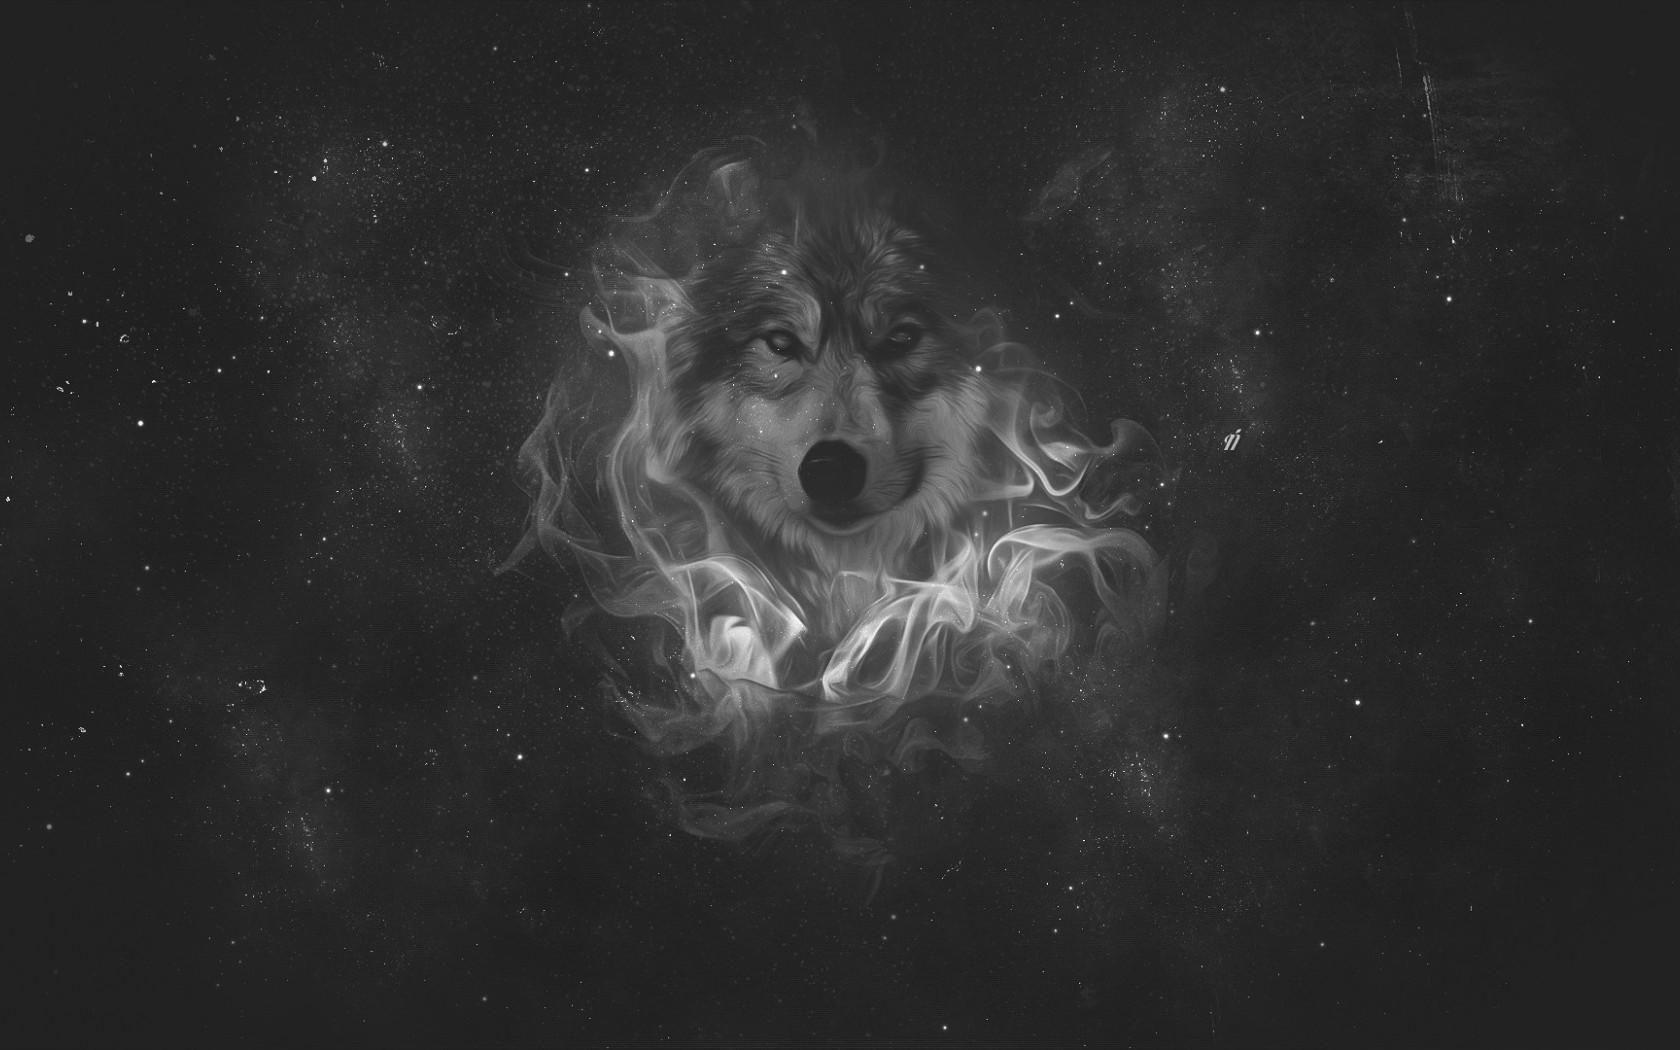 Full Hd P Wolf Wallpapers Hd Desktop Backgrounds X Wallpapers